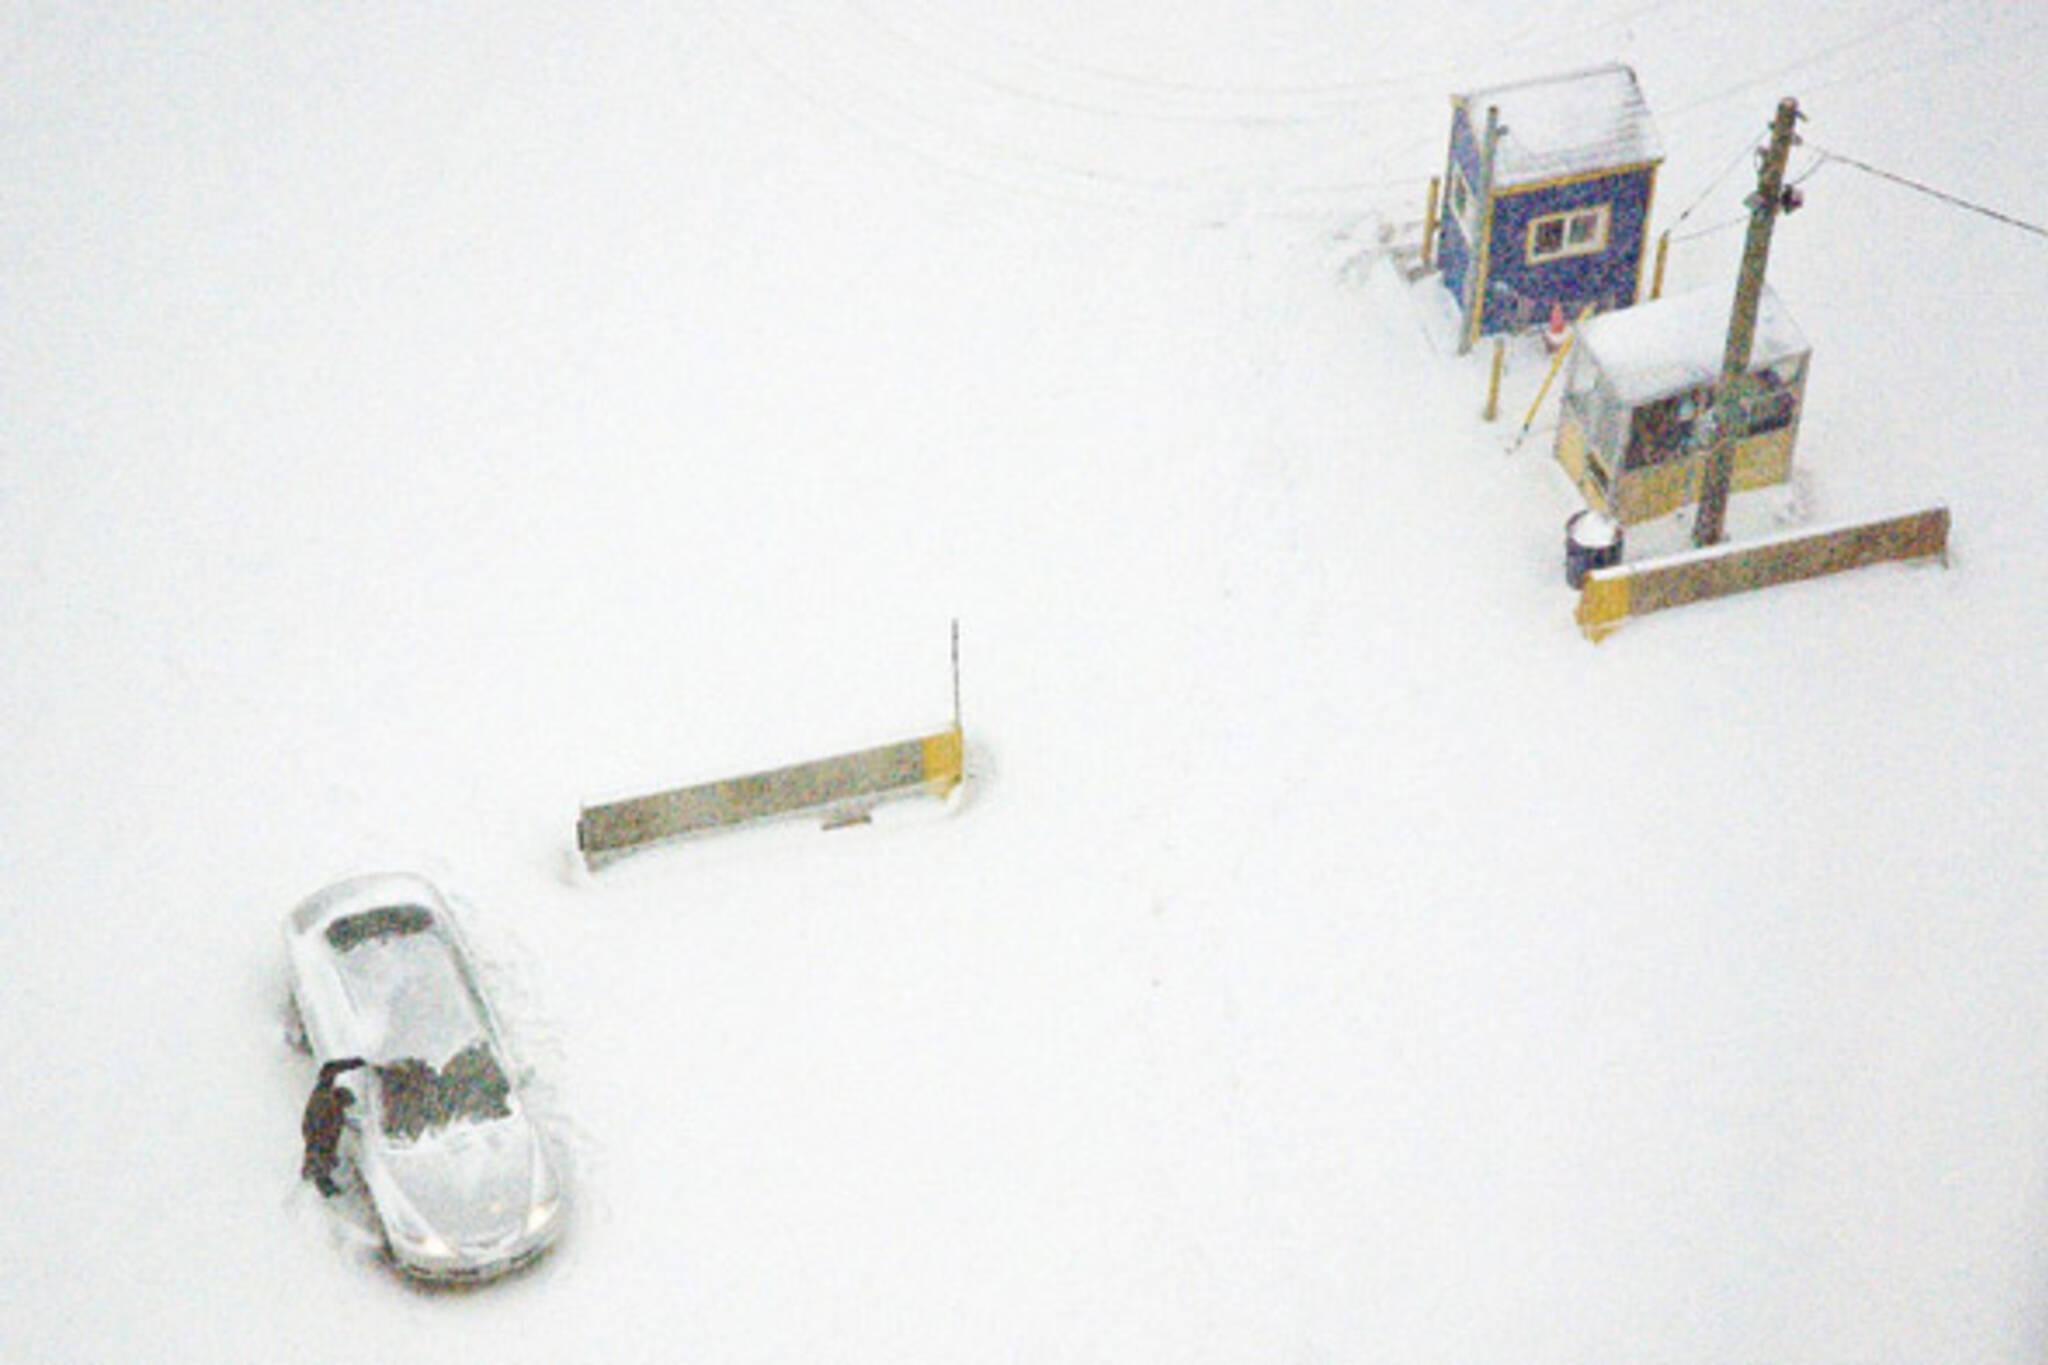 snow storm parking lot